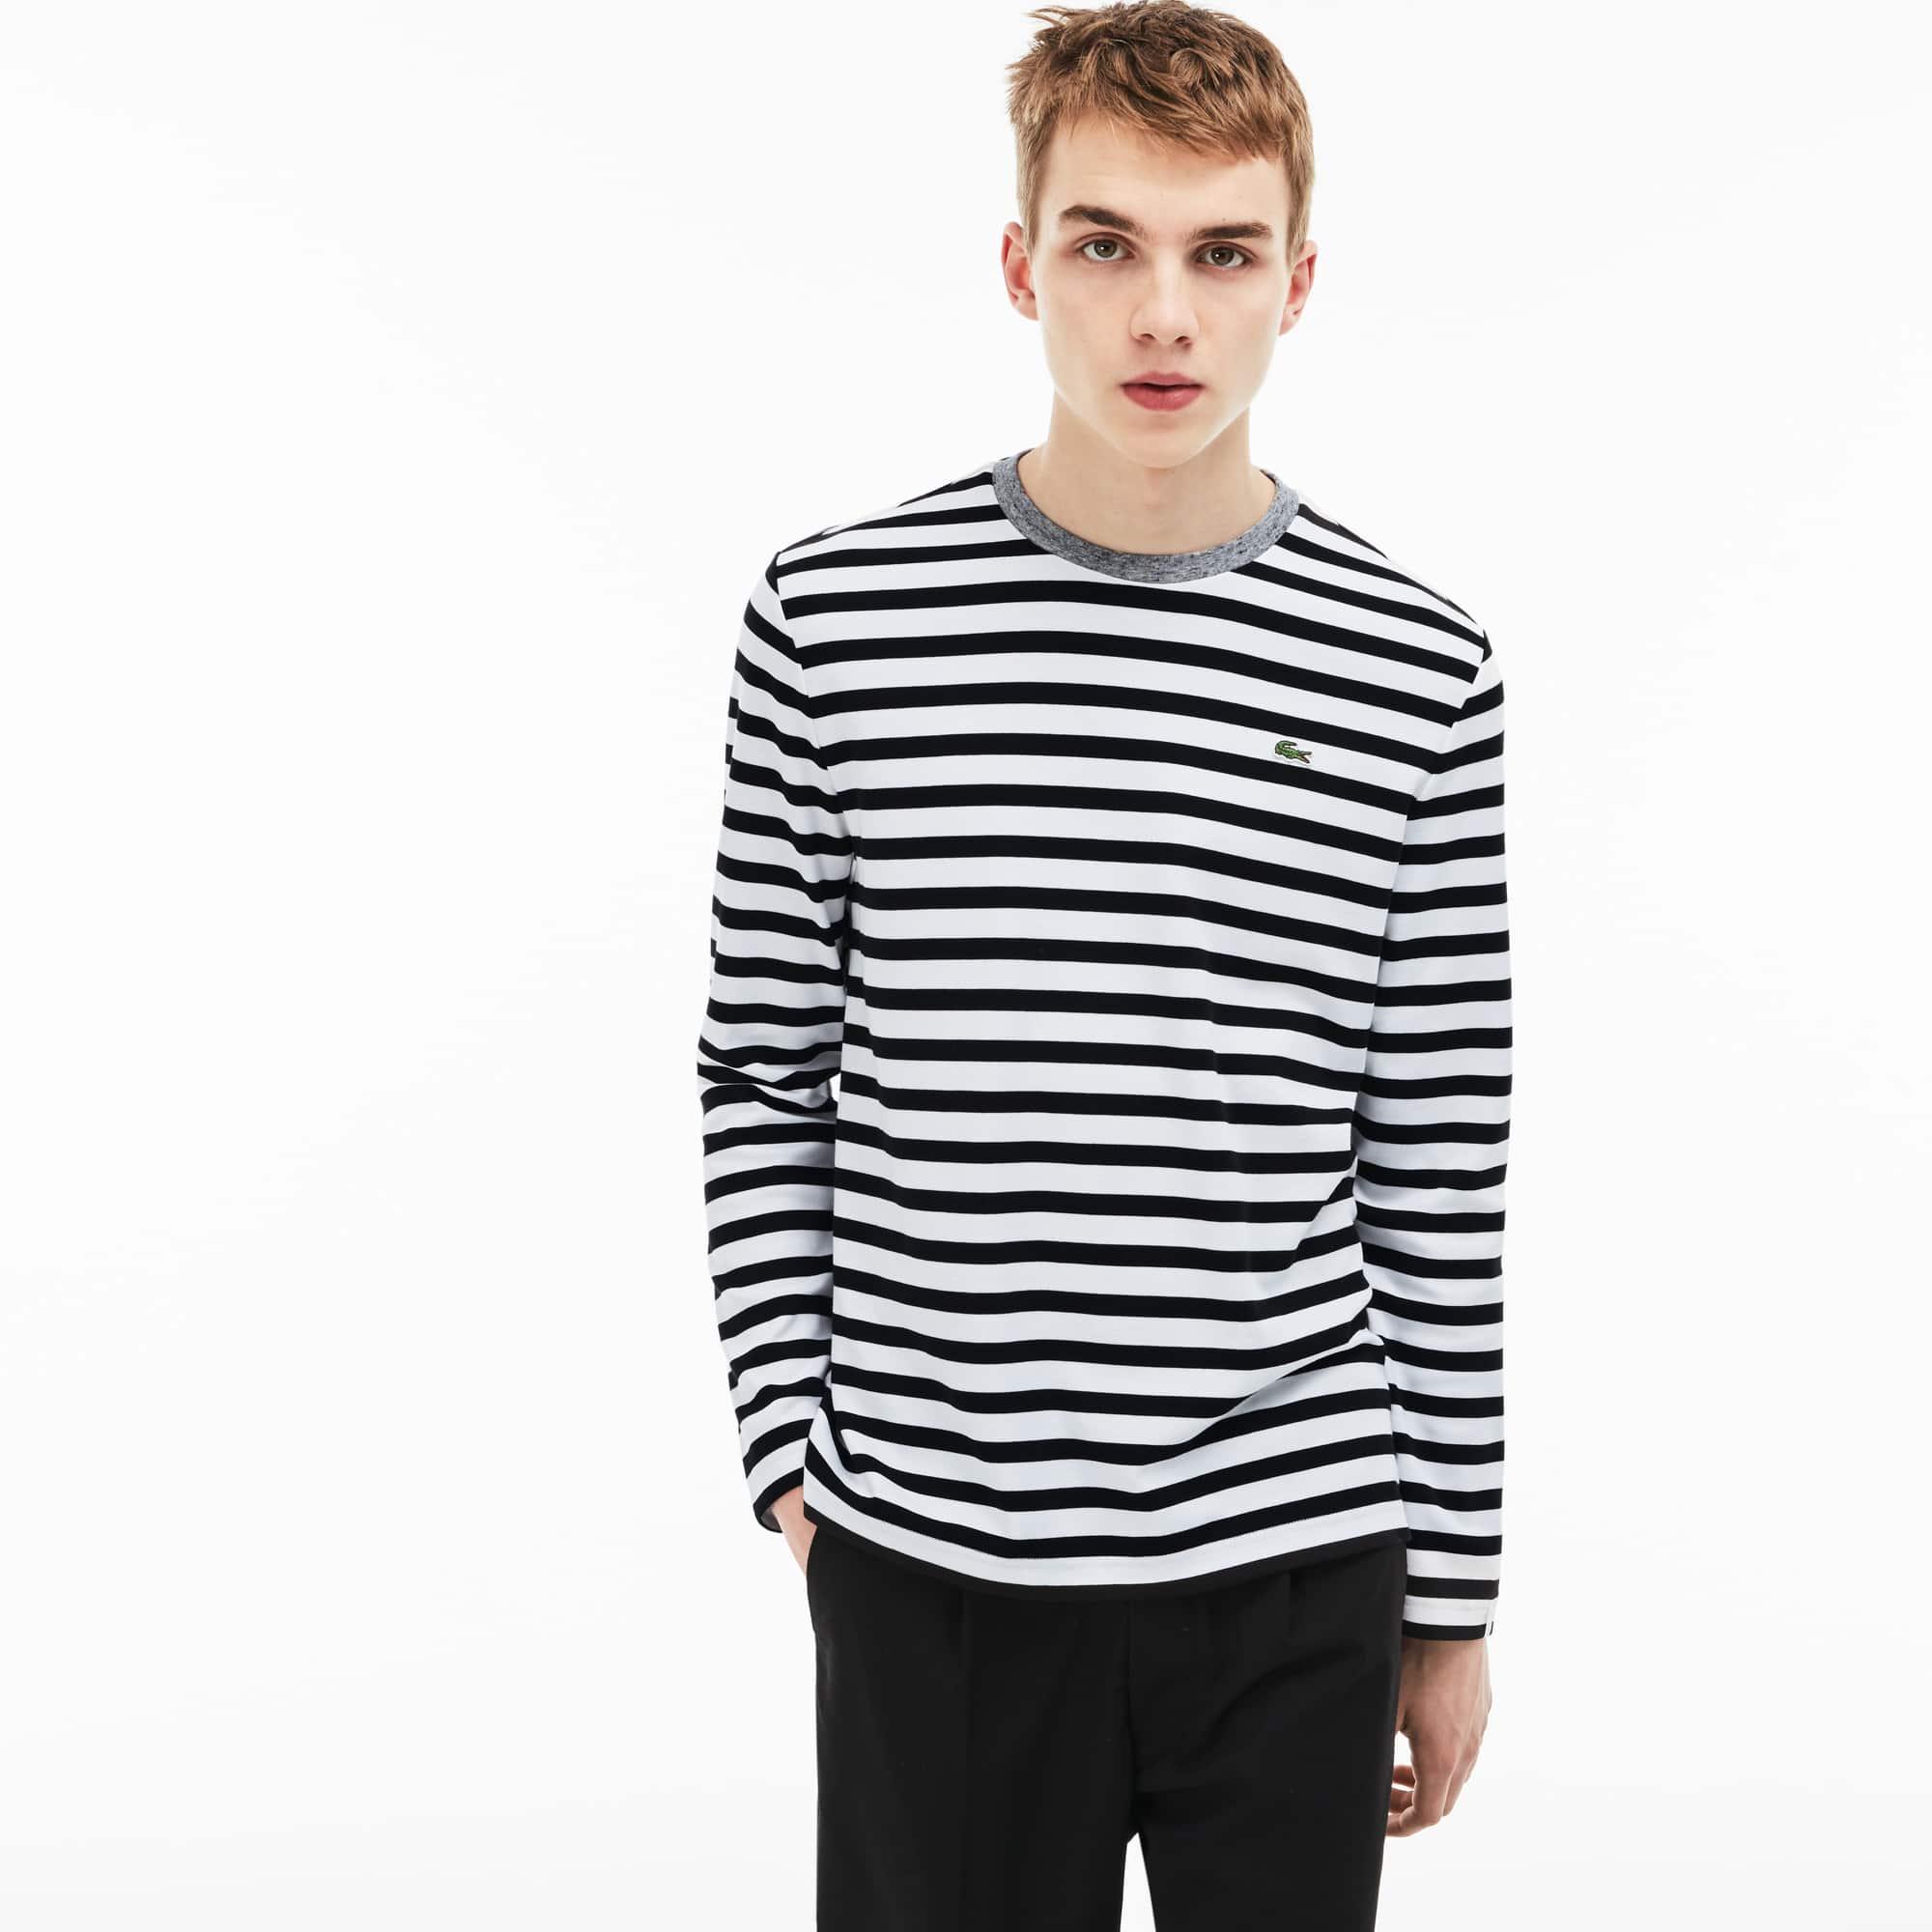 Maritimes Herren-Hemd aus Jersey mit Kontrastkragen LACOSTE L!VE